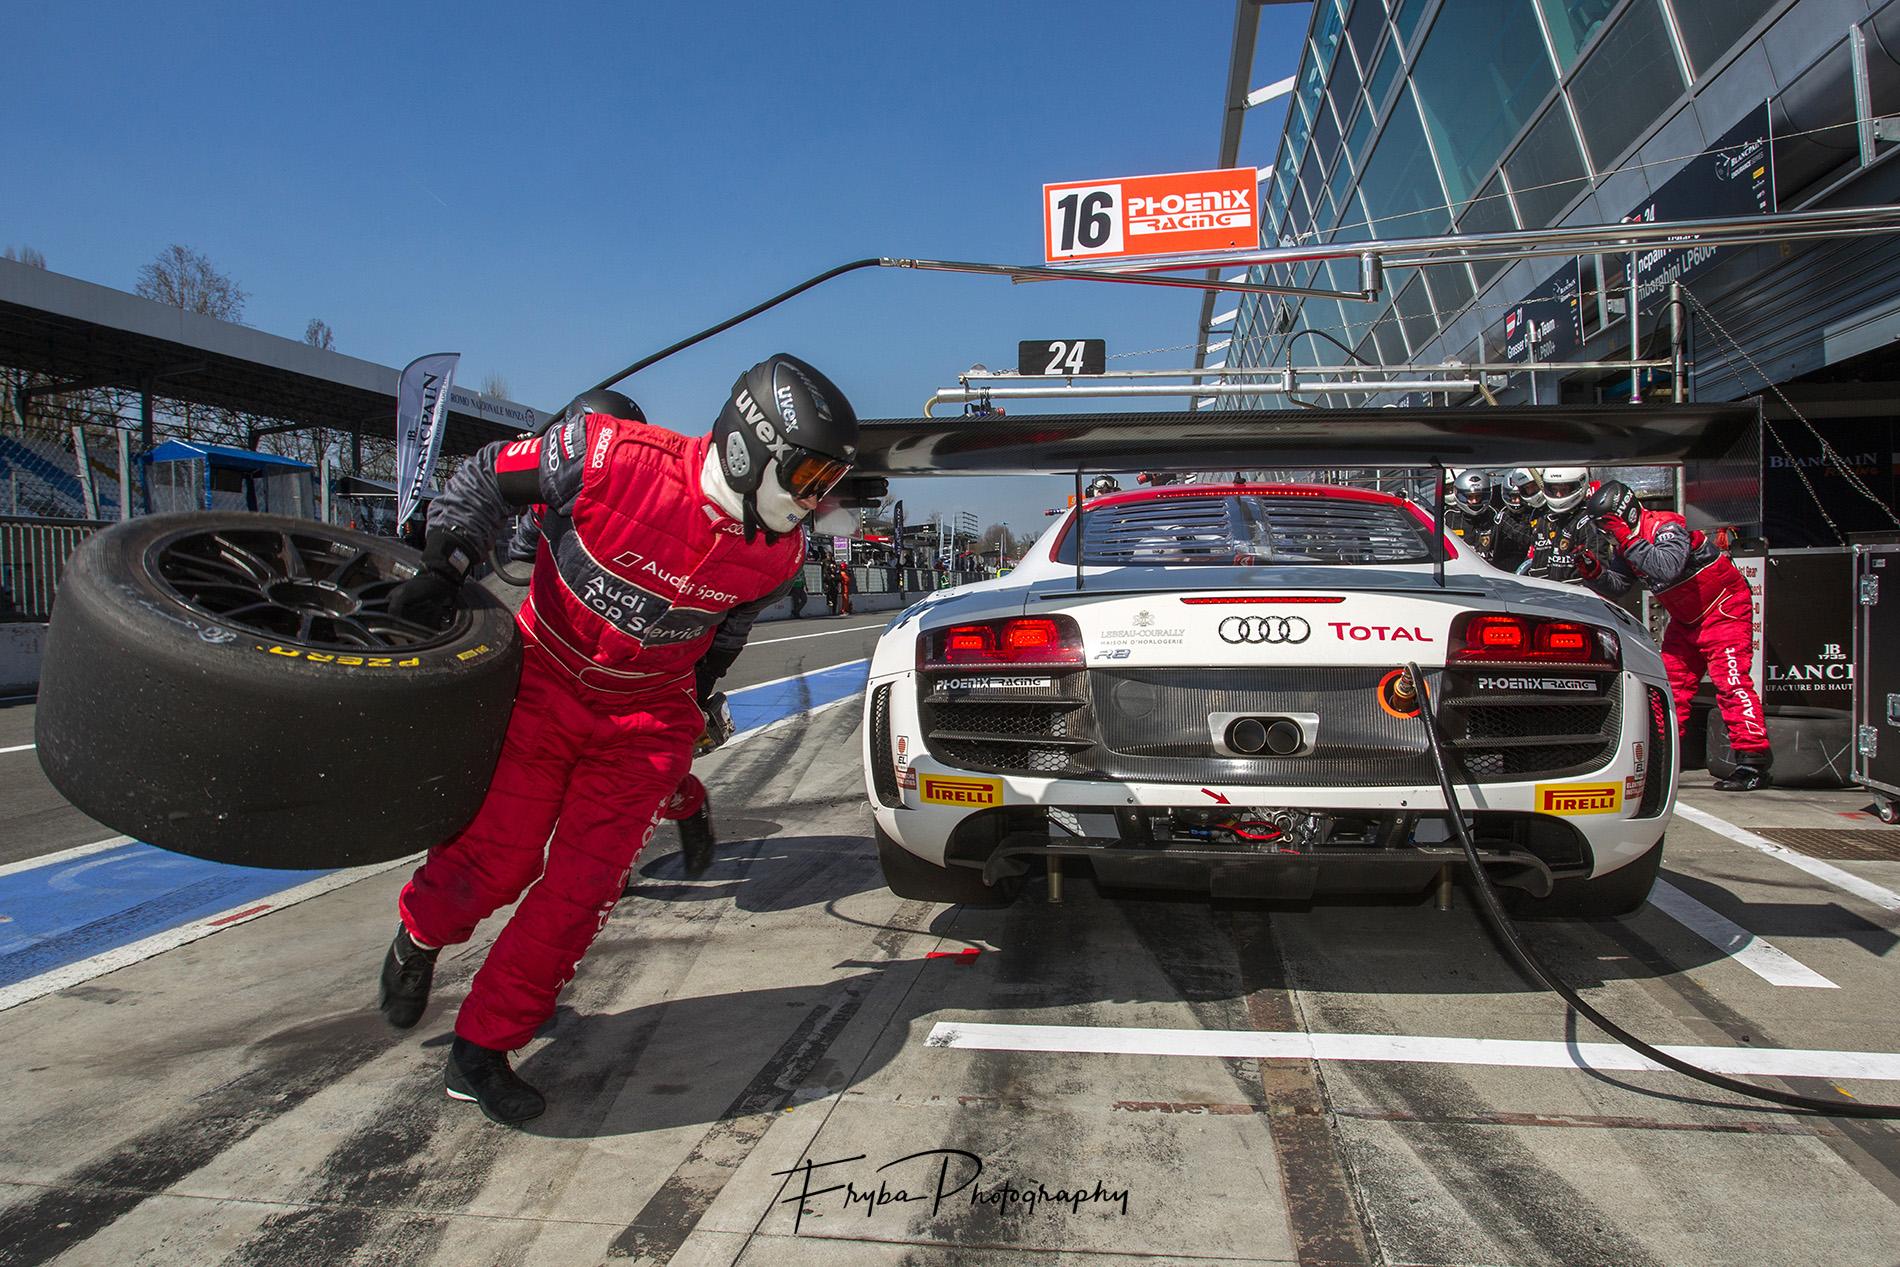 Blancpain-Endurance-Monza-2013-Audi